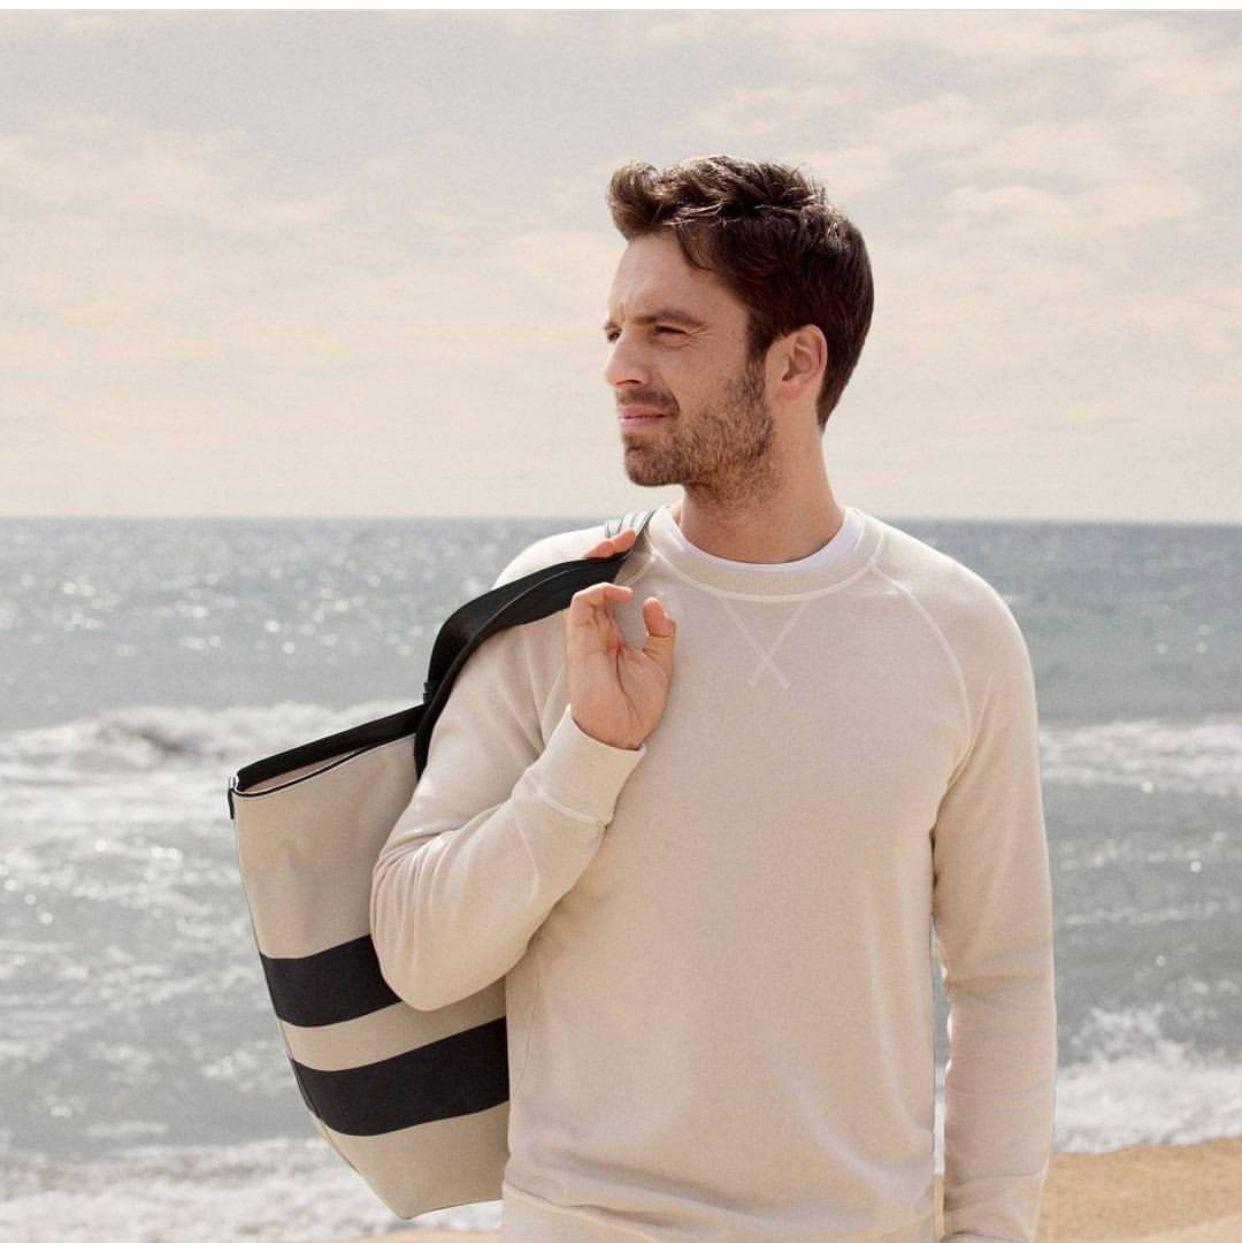 Seaside Sebby Stan in Hugo Boss 2018